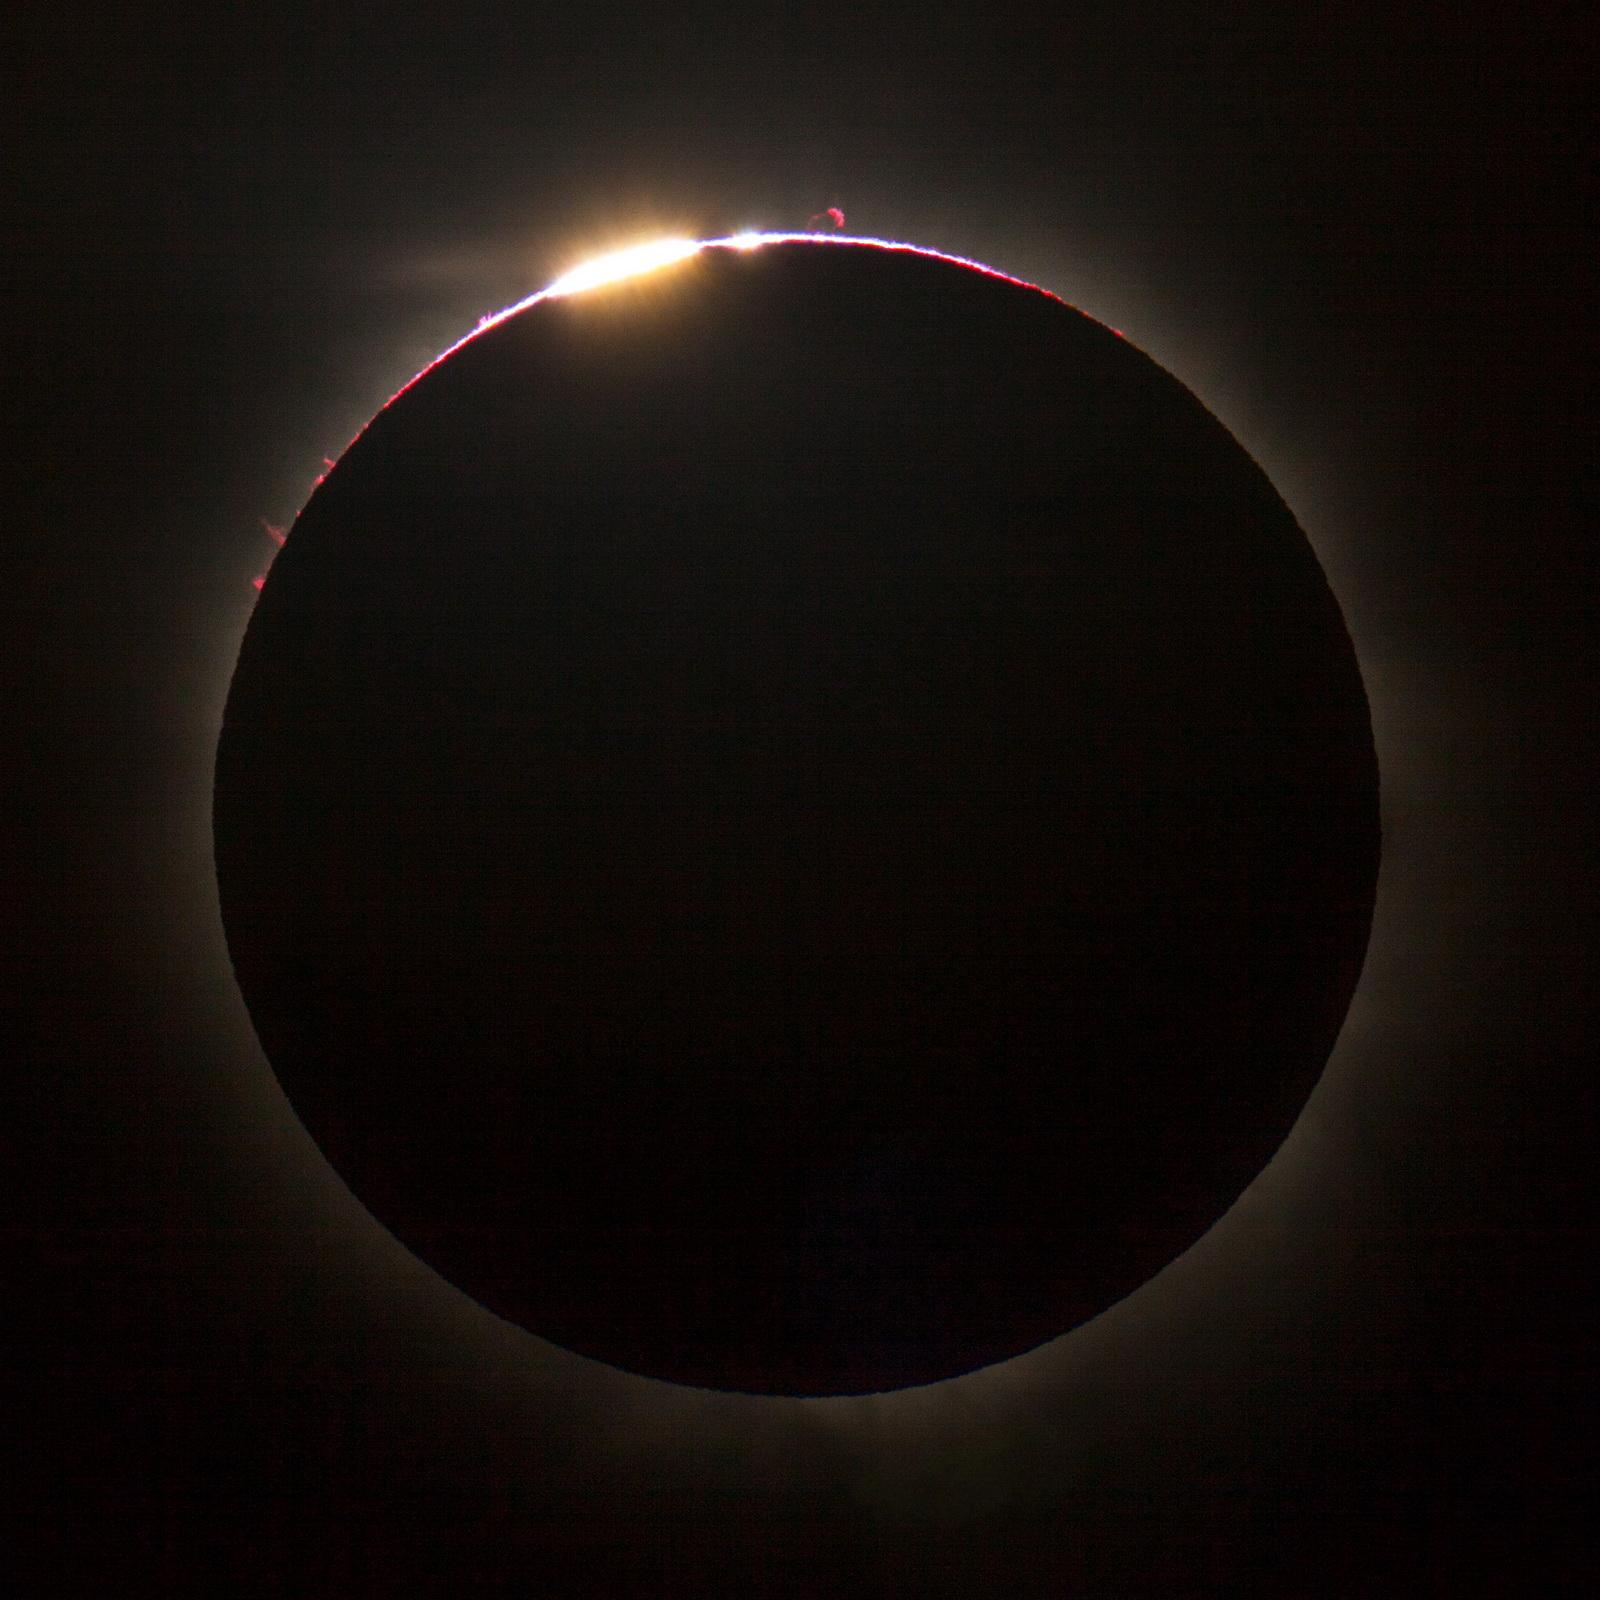 November 13 Solar Eclipse over Queensland, Australia